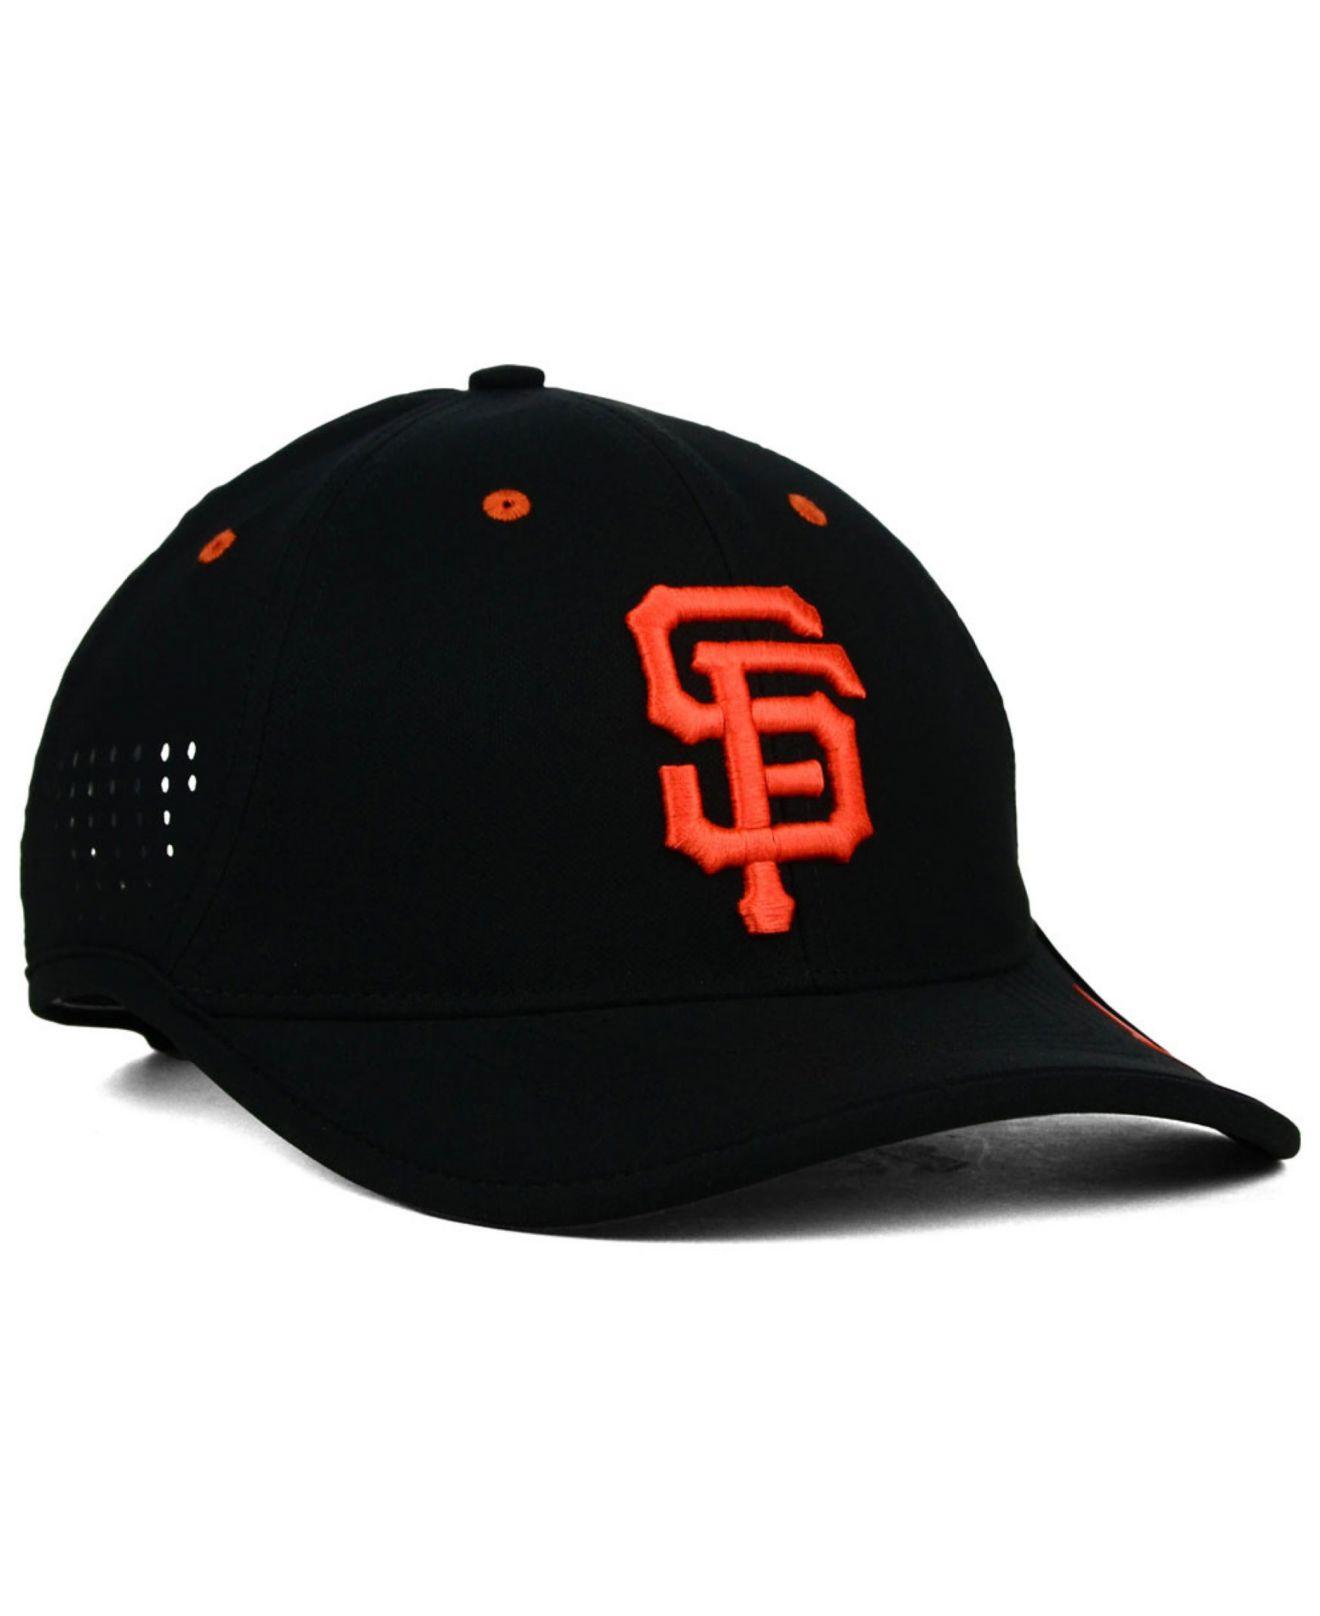 81ab8e6e7b114 Lyst - Nike San Francisco Giants Vapor Swoosh Adjustable Cap in ...